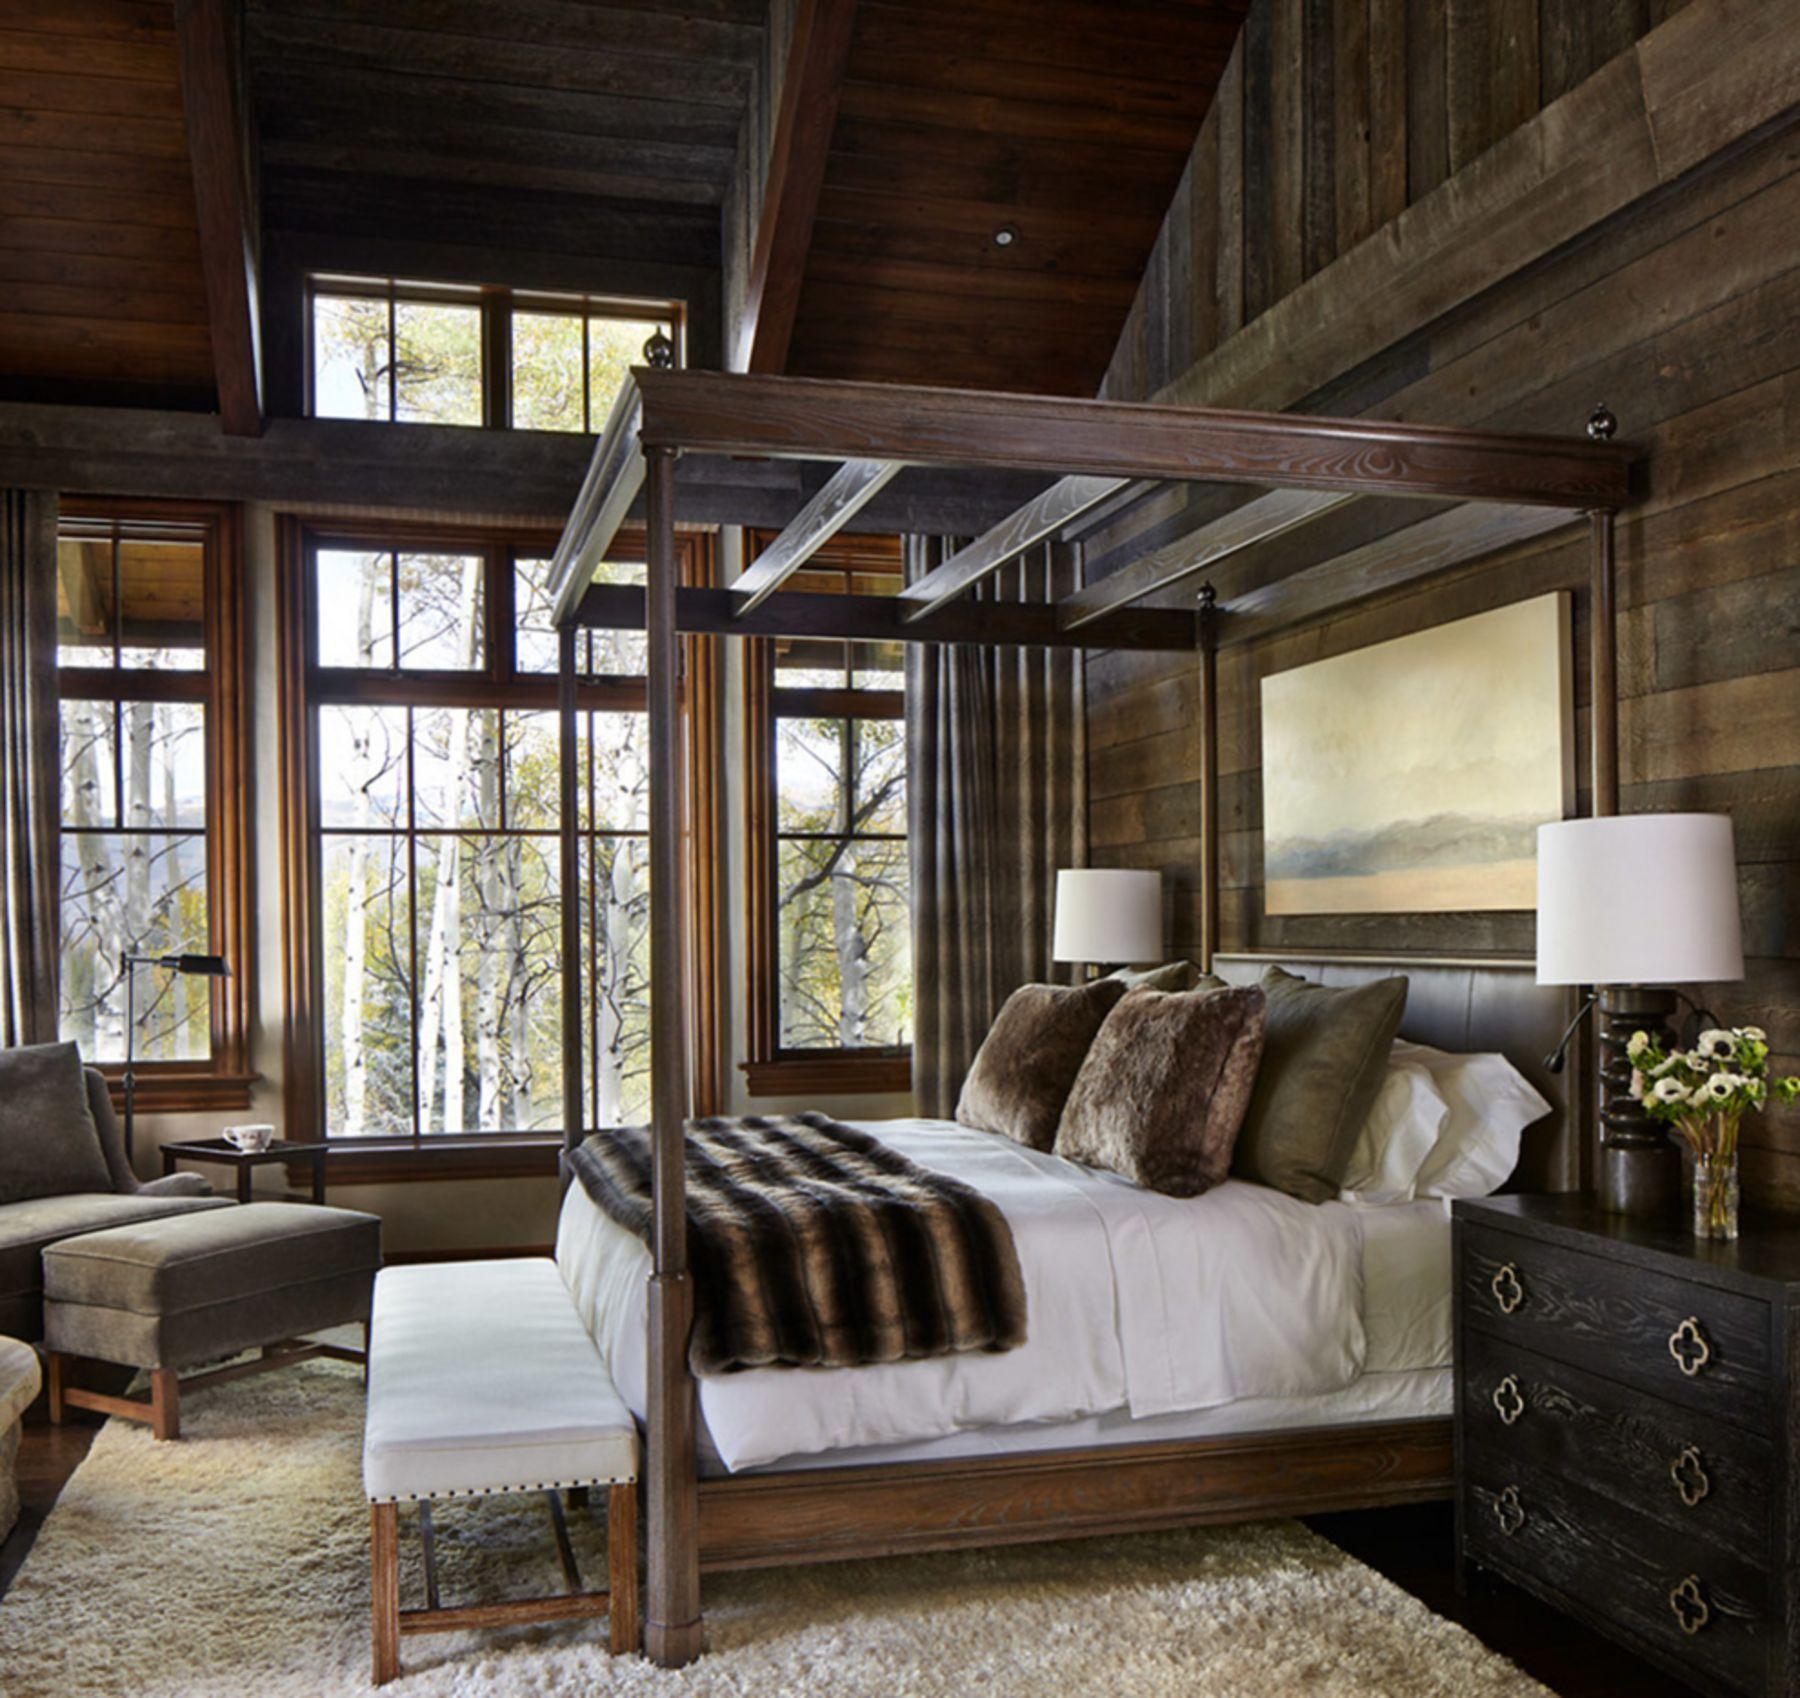 Top 10 Modern Rustic Interior Ideas For Master Bedroom Elegant